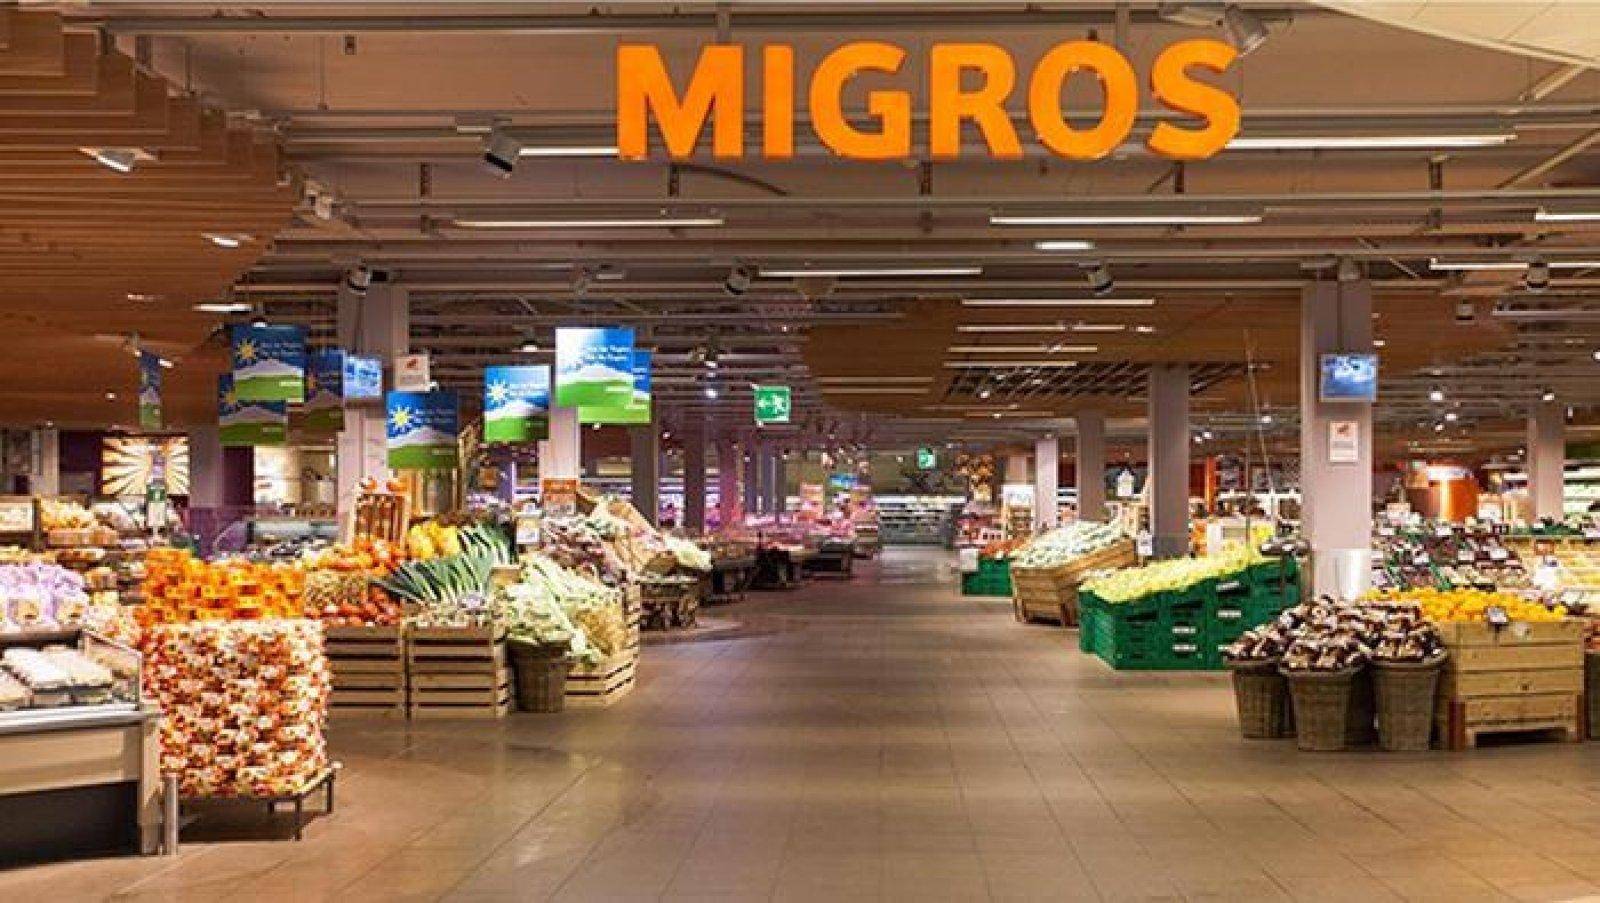 Migros Marketleri